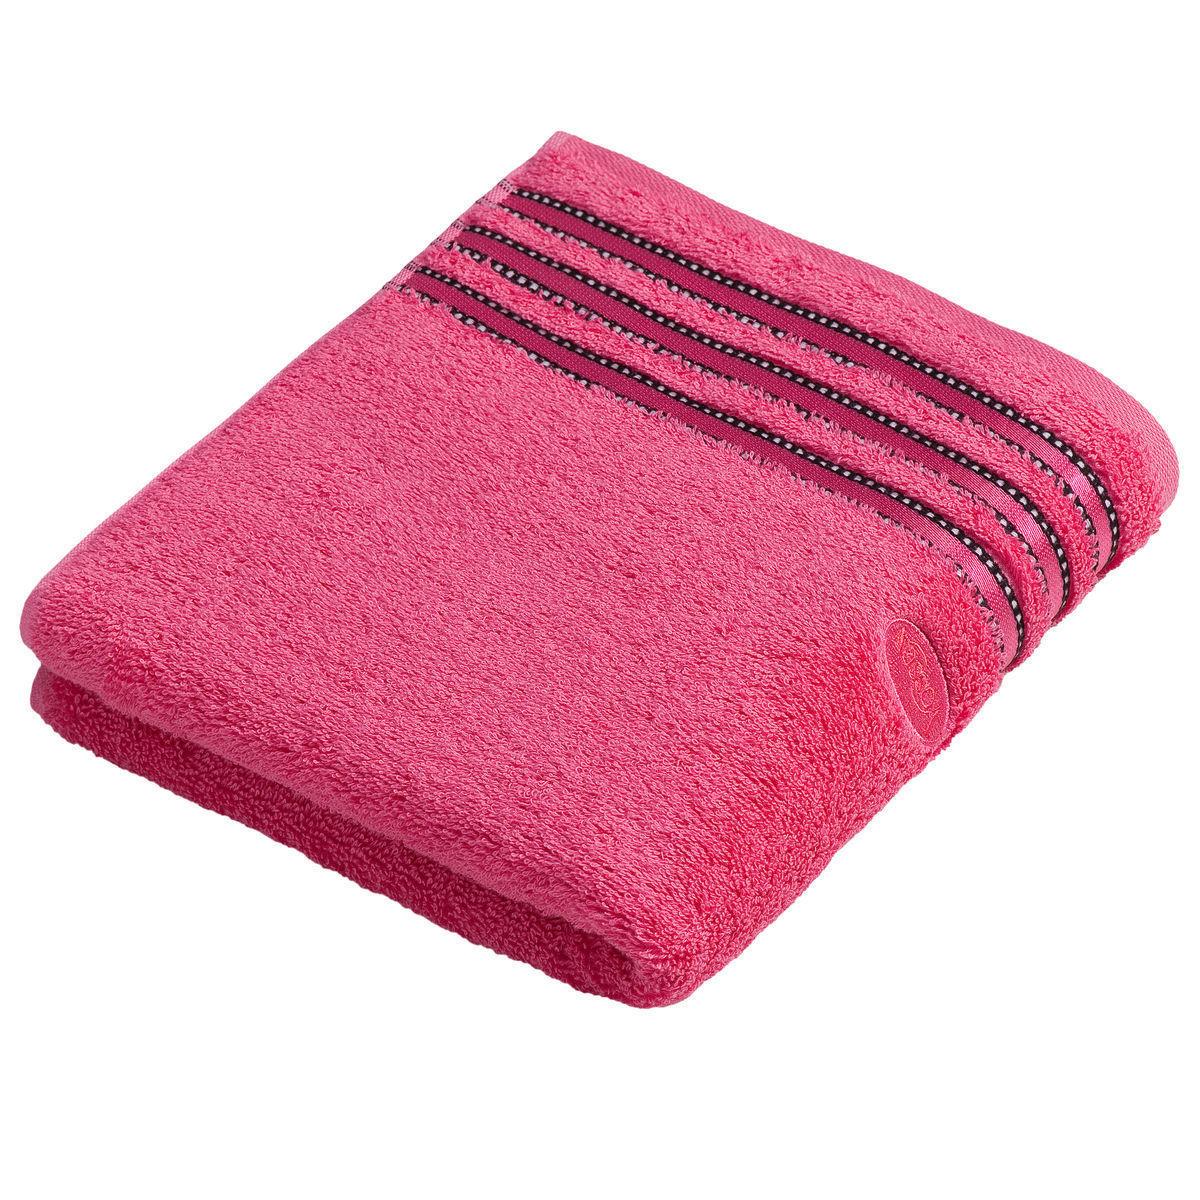 Полотенца Полотенце 30x50 Vossen Cult de Luxe rosy pink elitnoe-polotentse-cult-de-luxe-rosy-pink-ot-vossen-avstriya-50x100-1.jpg